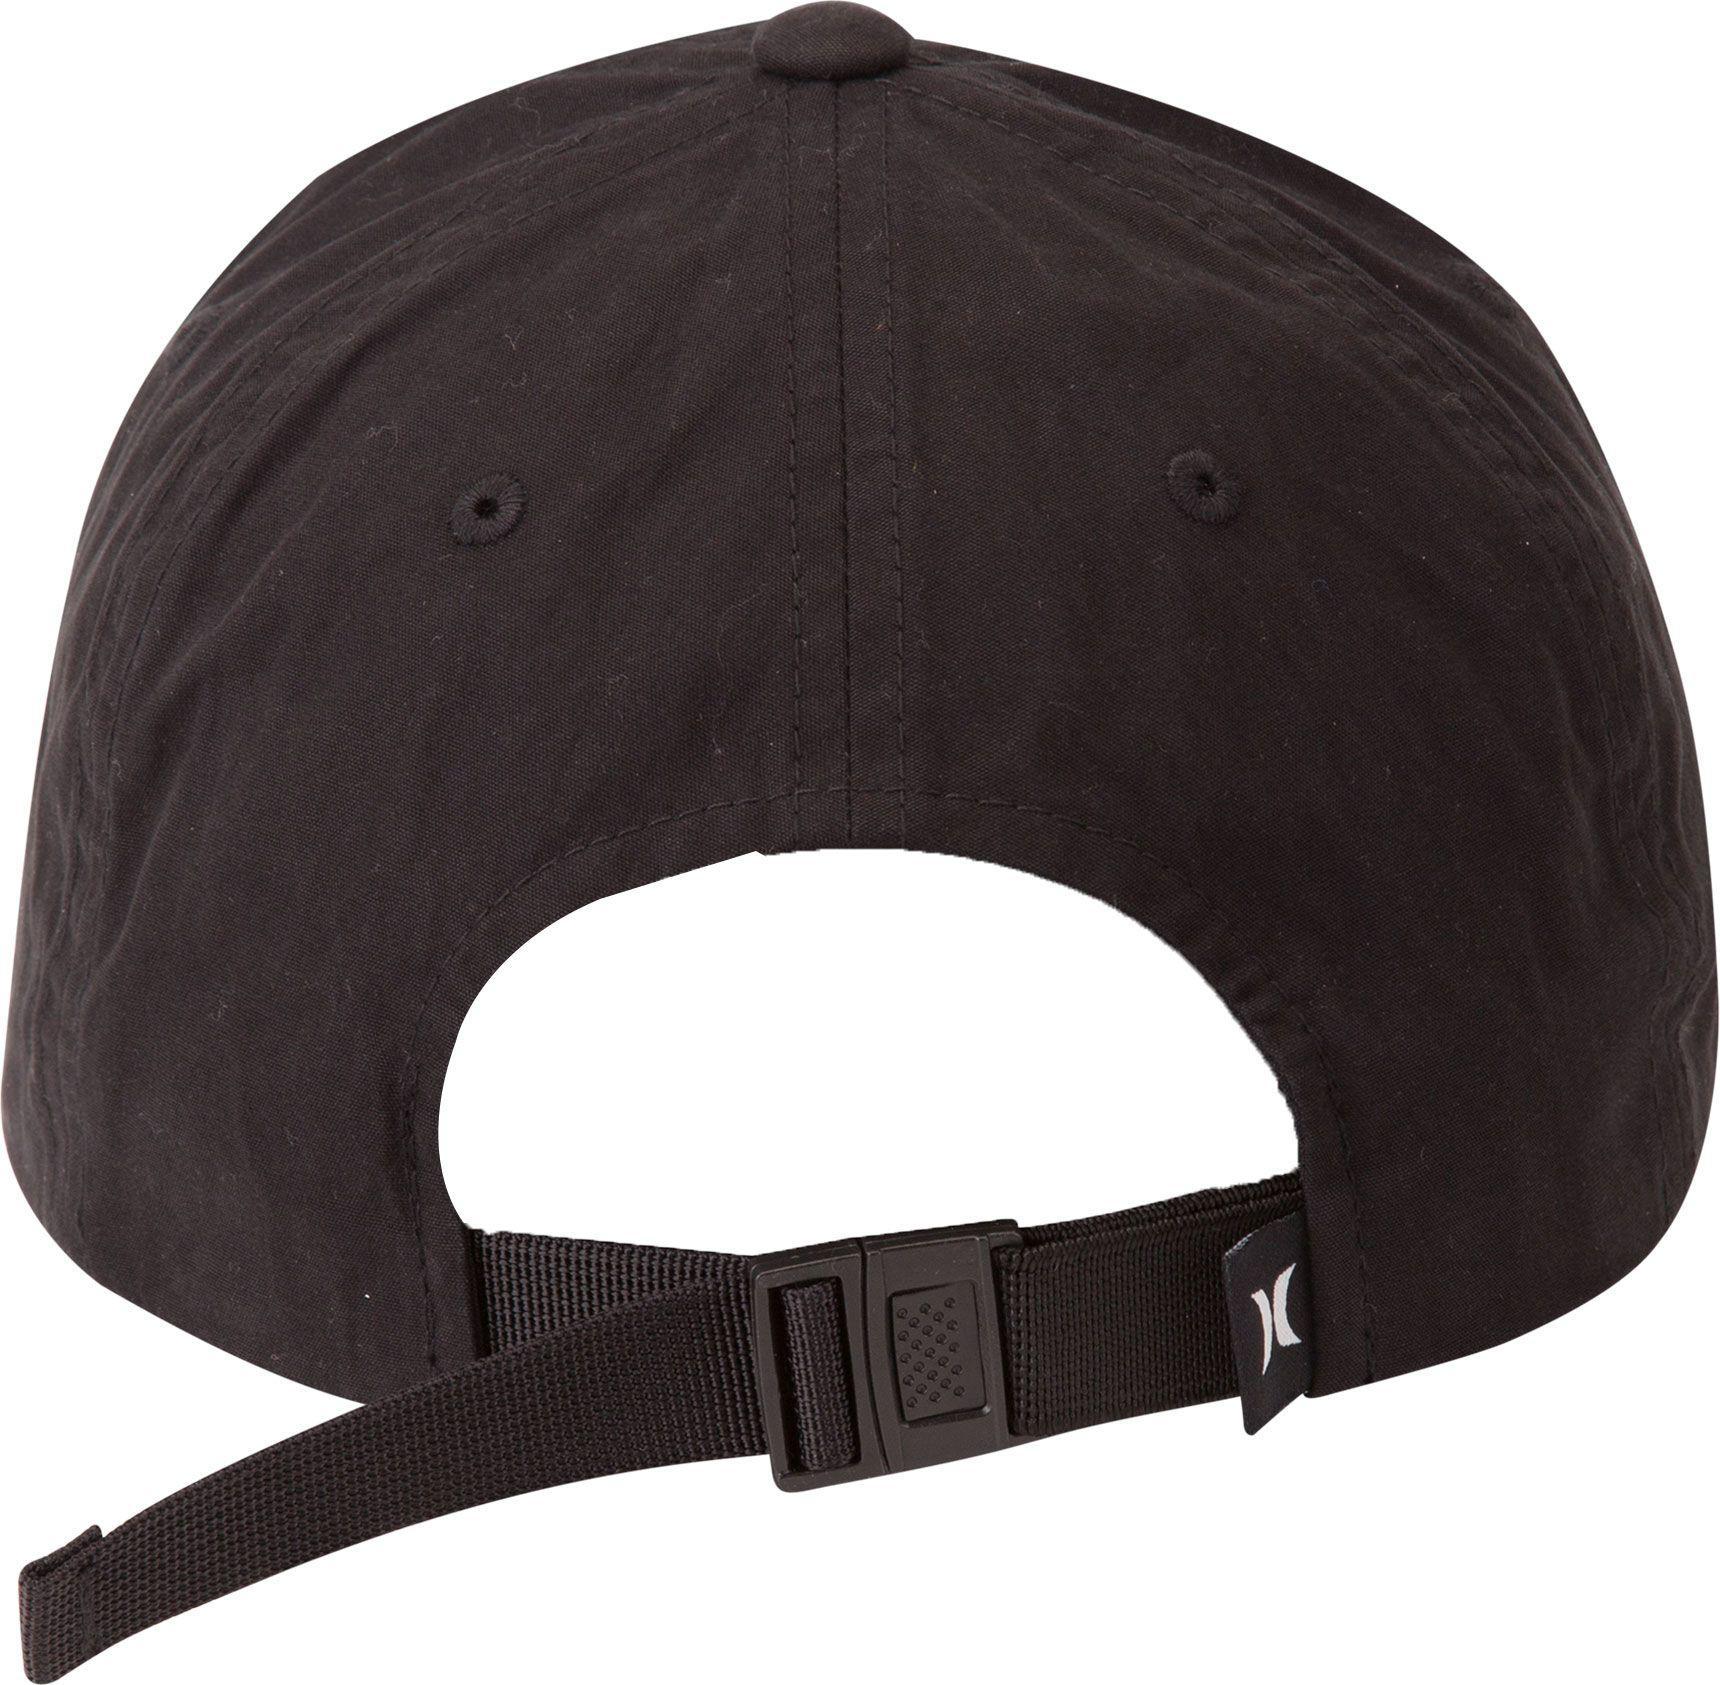 Lyst - Hurley Chiller Adjustable Hat in Black for Men 4cb324728e7